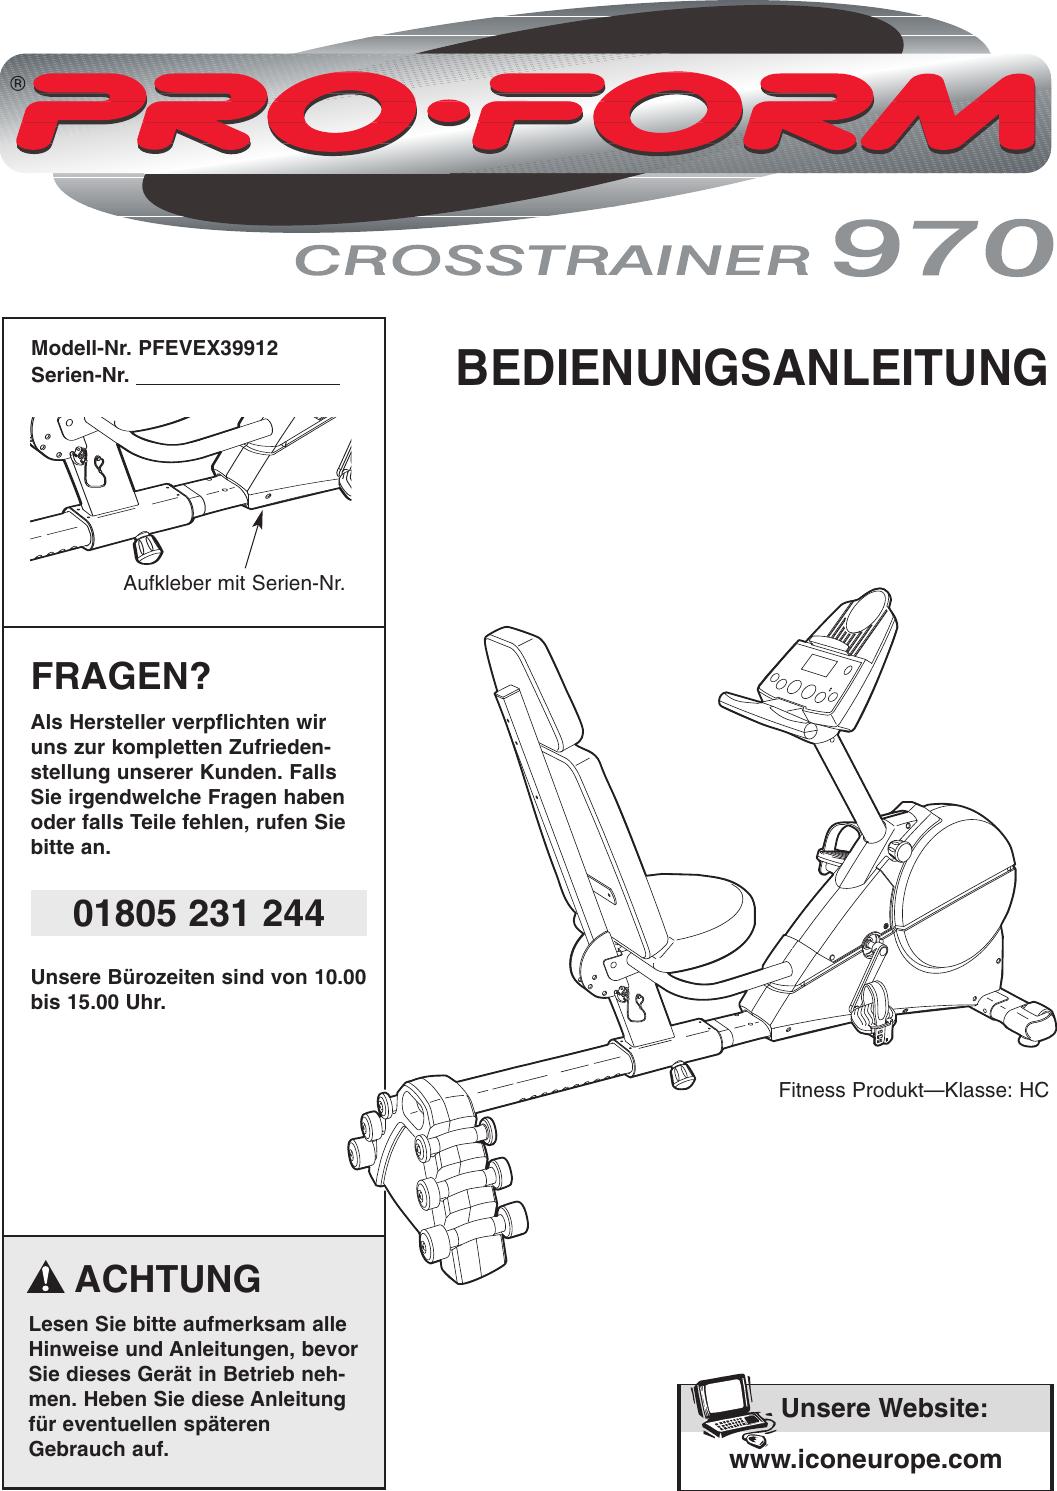 Proform Pfevex39912 Crosstrainer 970 Bike Users Manual !PFEVEX39912 ...